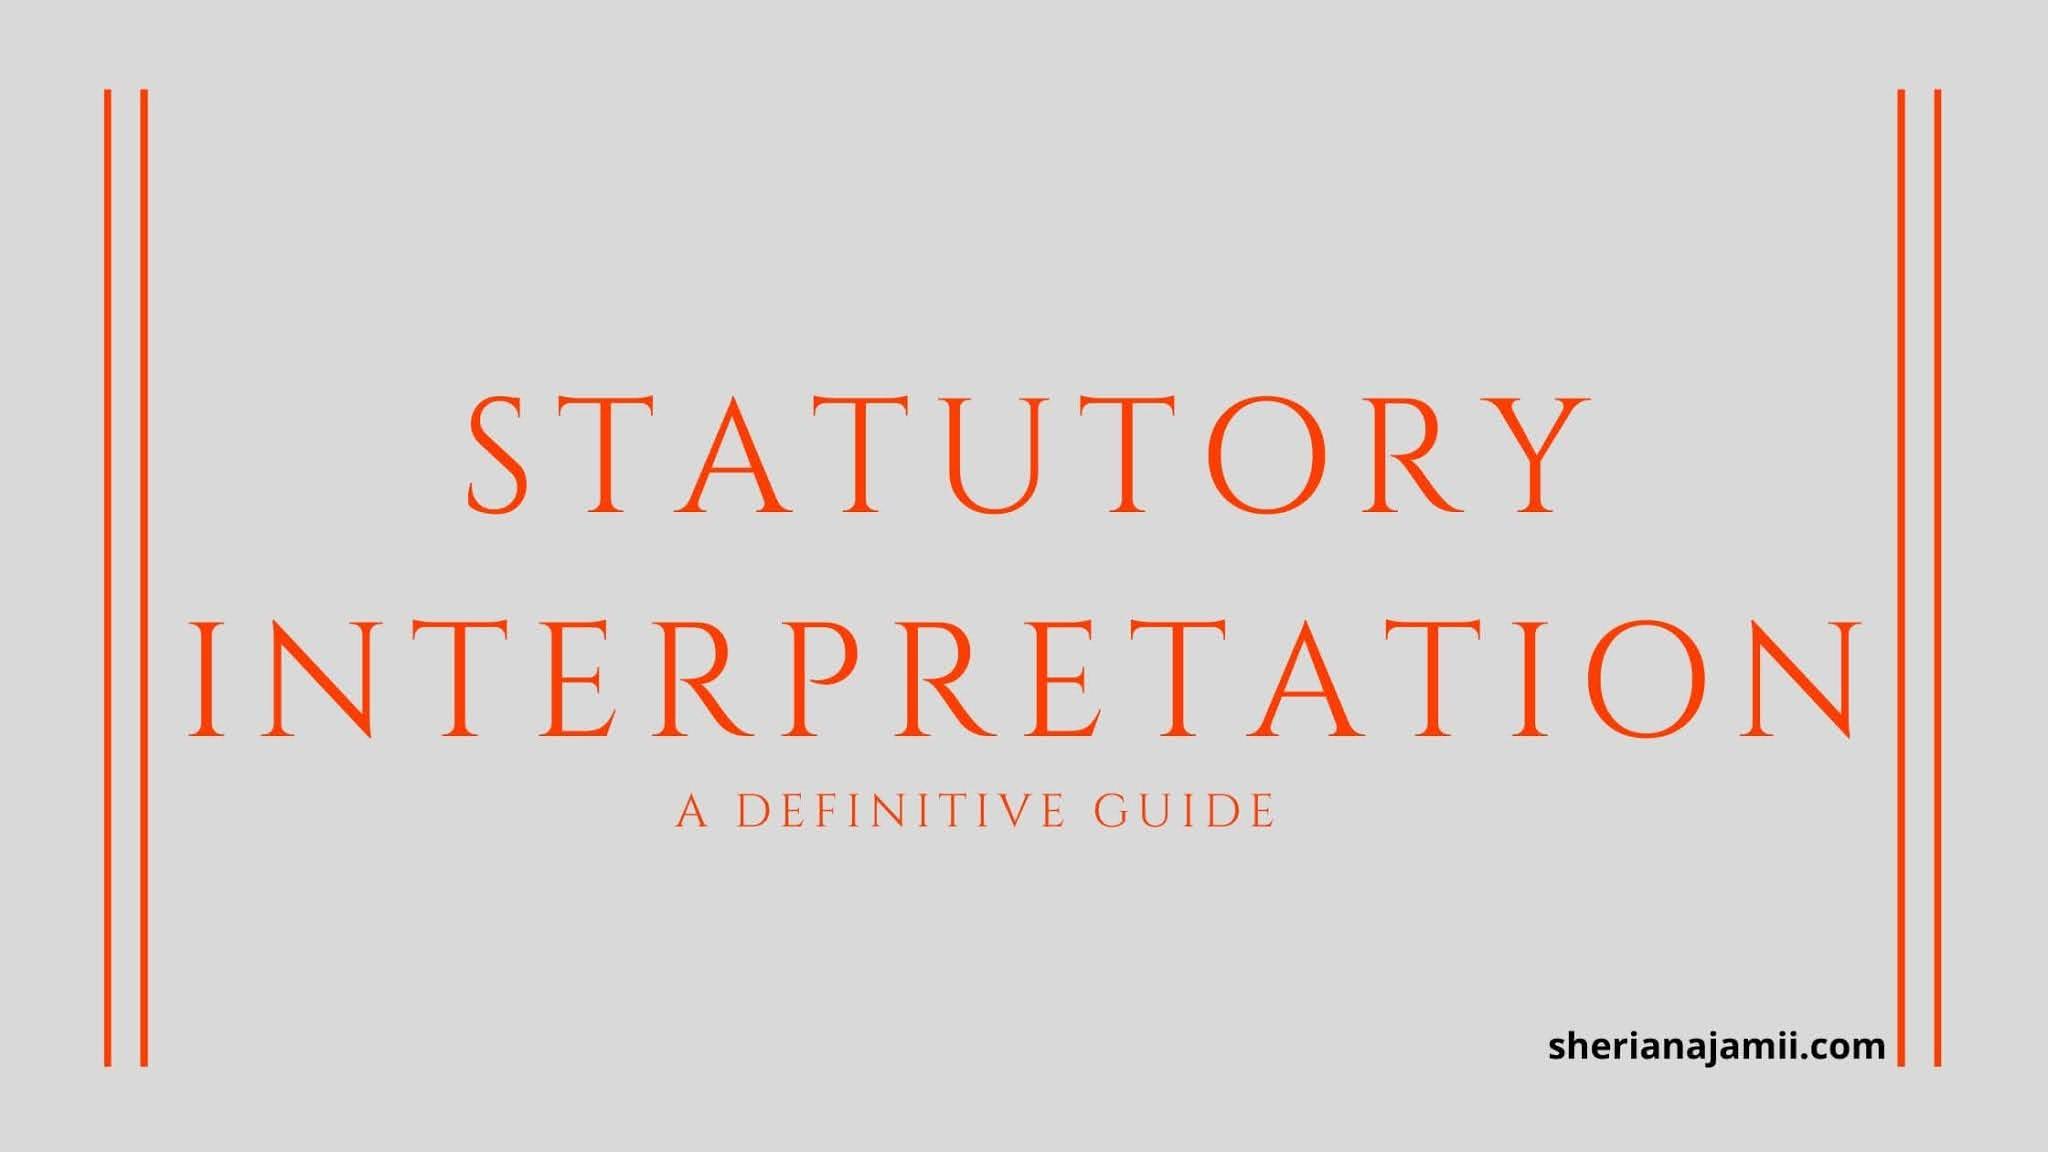 statutory interpretation, rules/aprroches of statutory interpretation, the plain meaning rule, the golden rule, the purposive approach rule